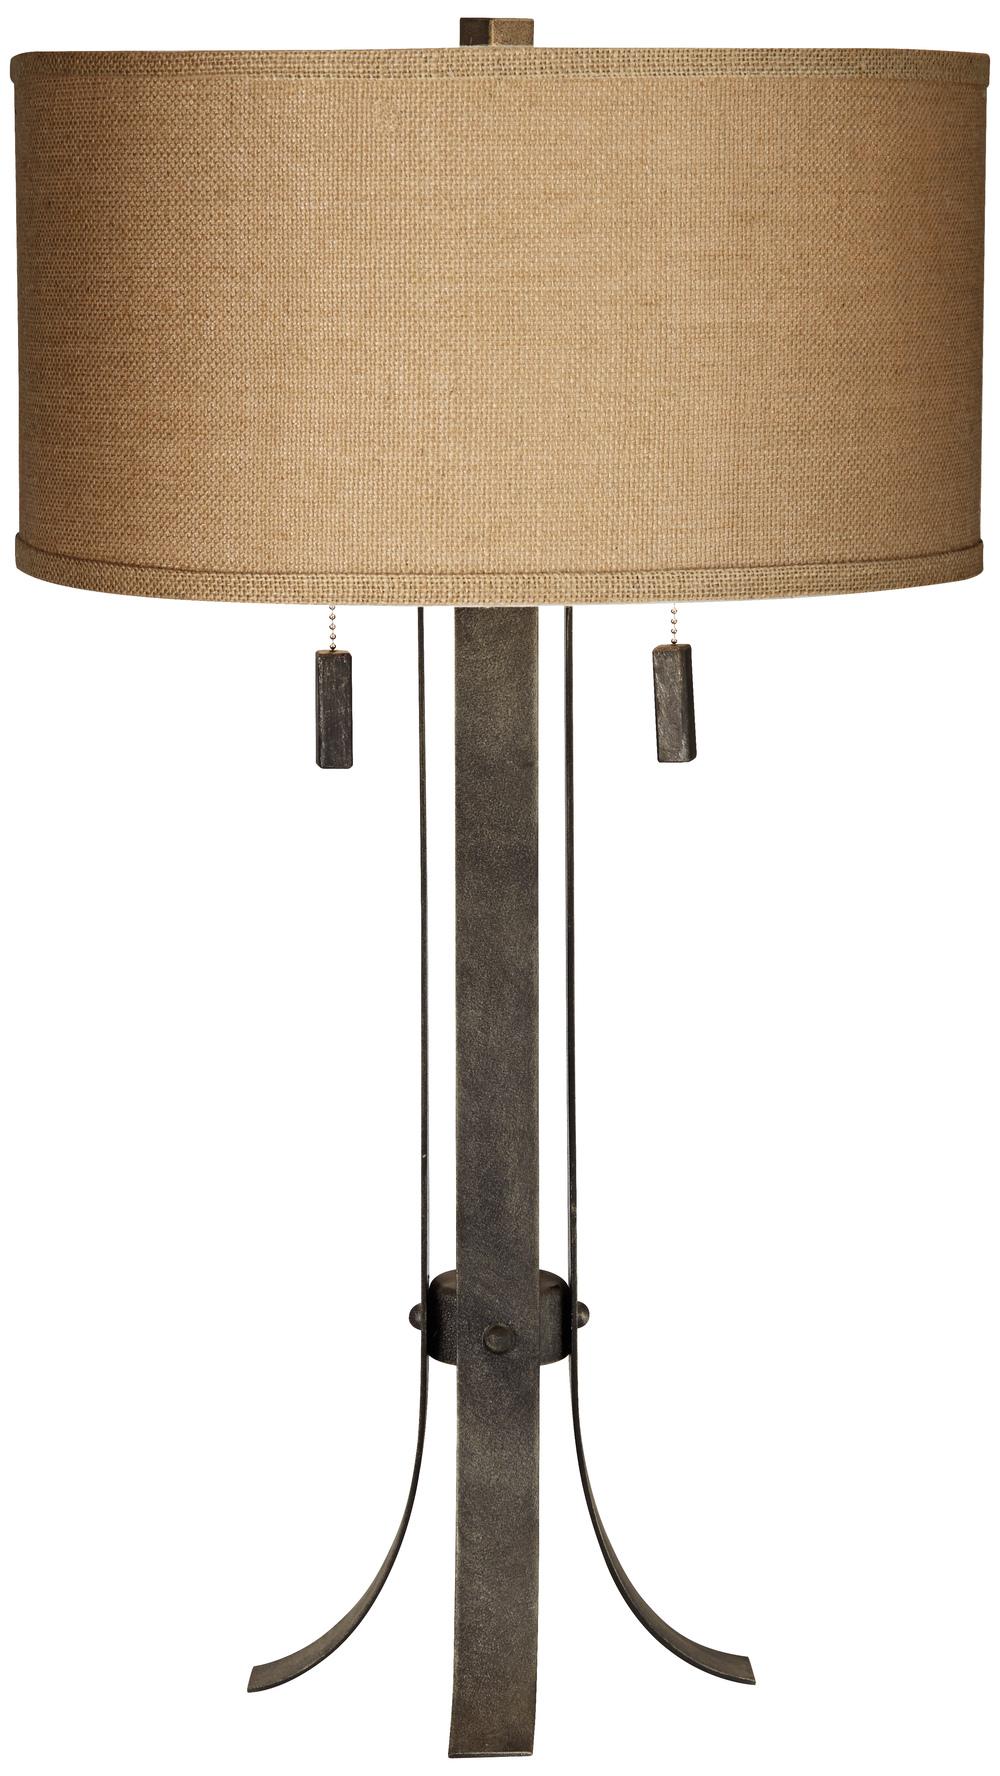 Pacific Coast Lighting - Pullman Table Lamp